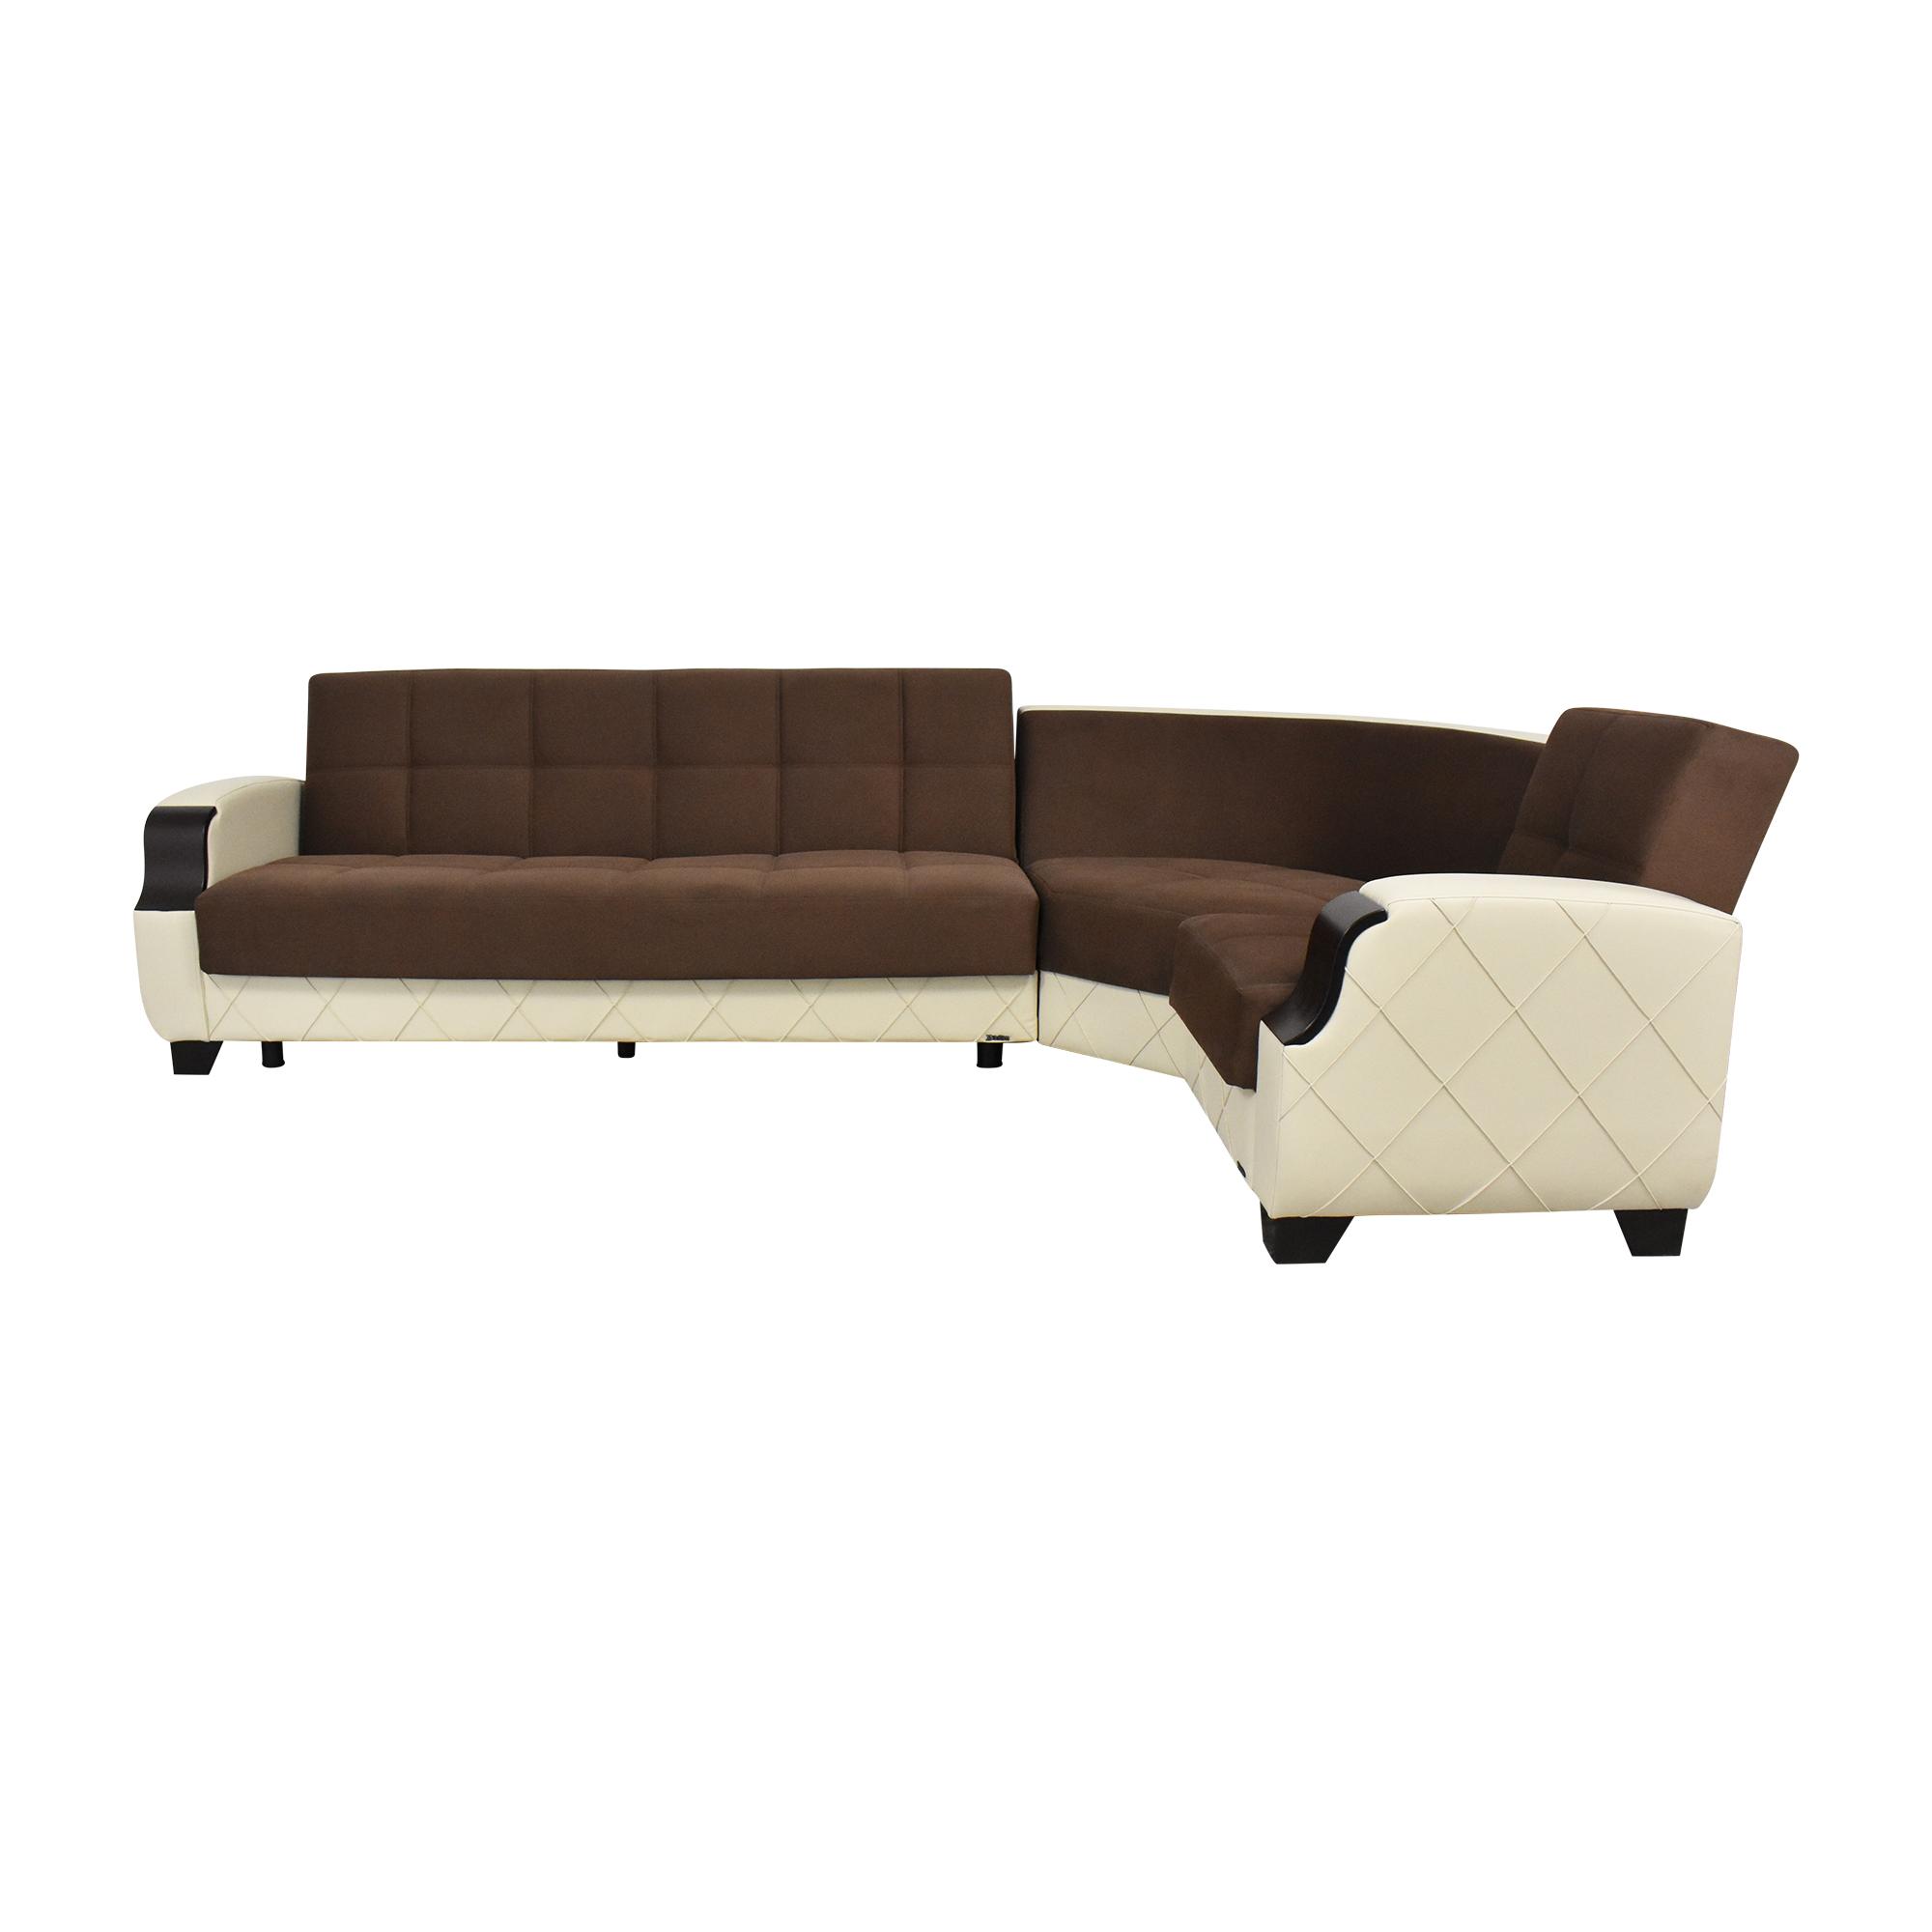 Kilim Kilim Two Tone Sectional Sleeper Sofa with Storage dimensions